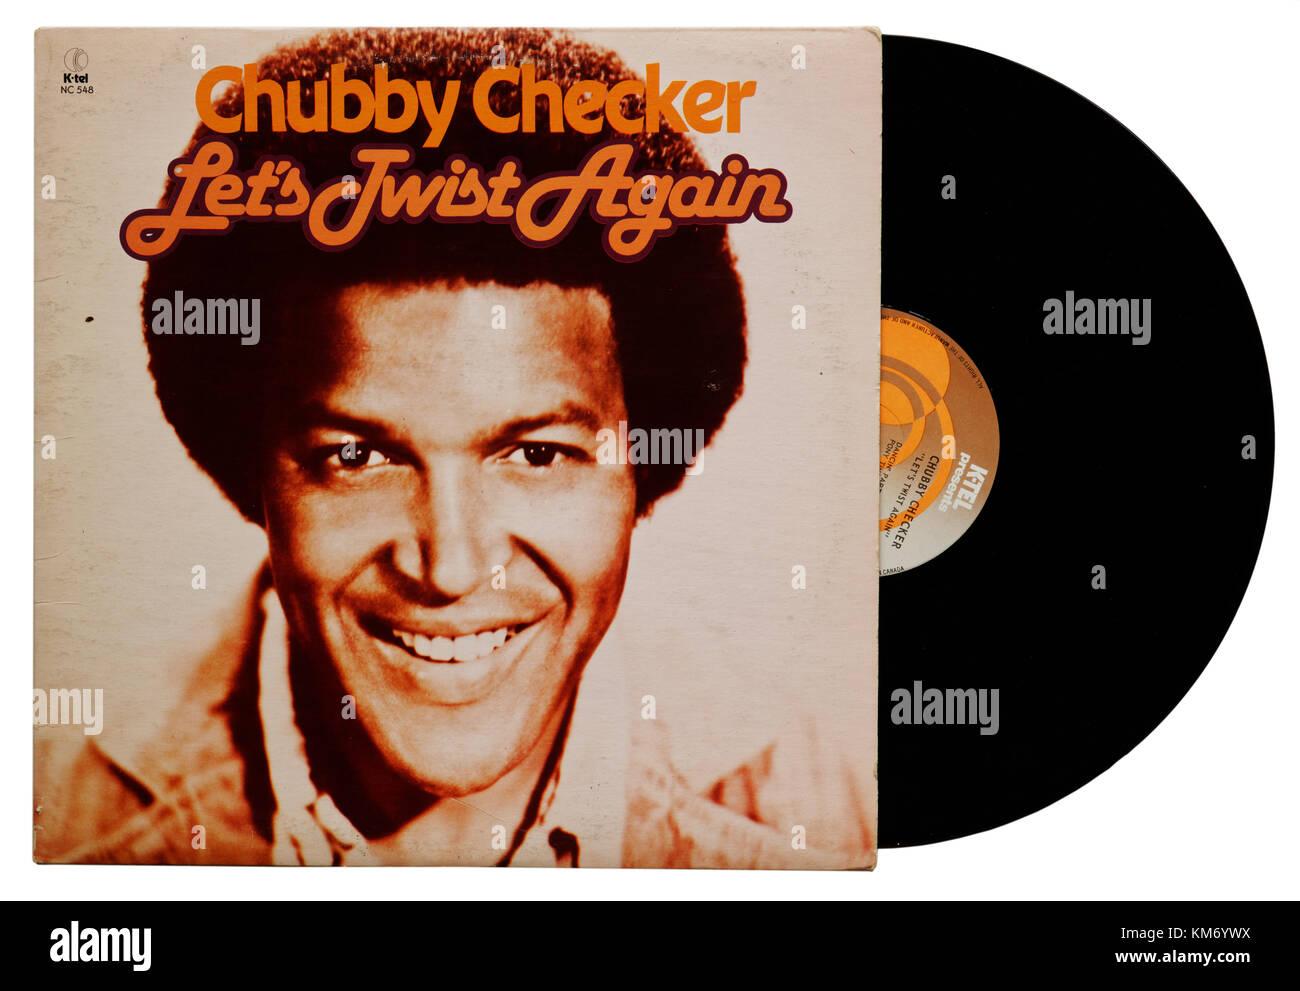 Chubby Checker Let's Twist Again album Photo Stock